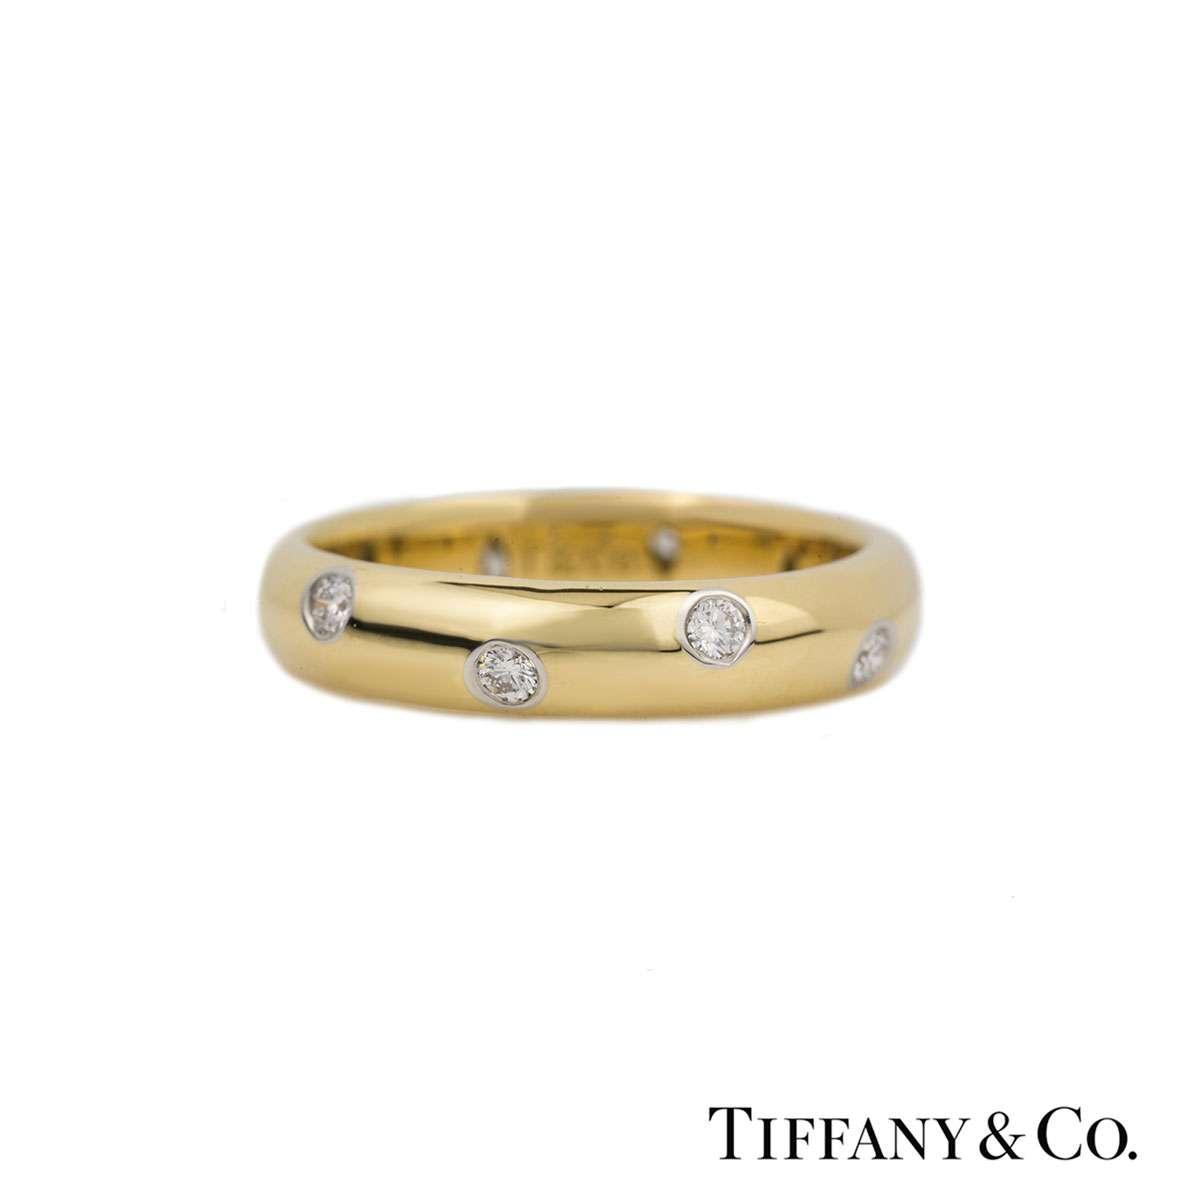 Tiffany & Co. Yellow Gold Diamond Etoile Wedding Ring 0.22ct G/VS